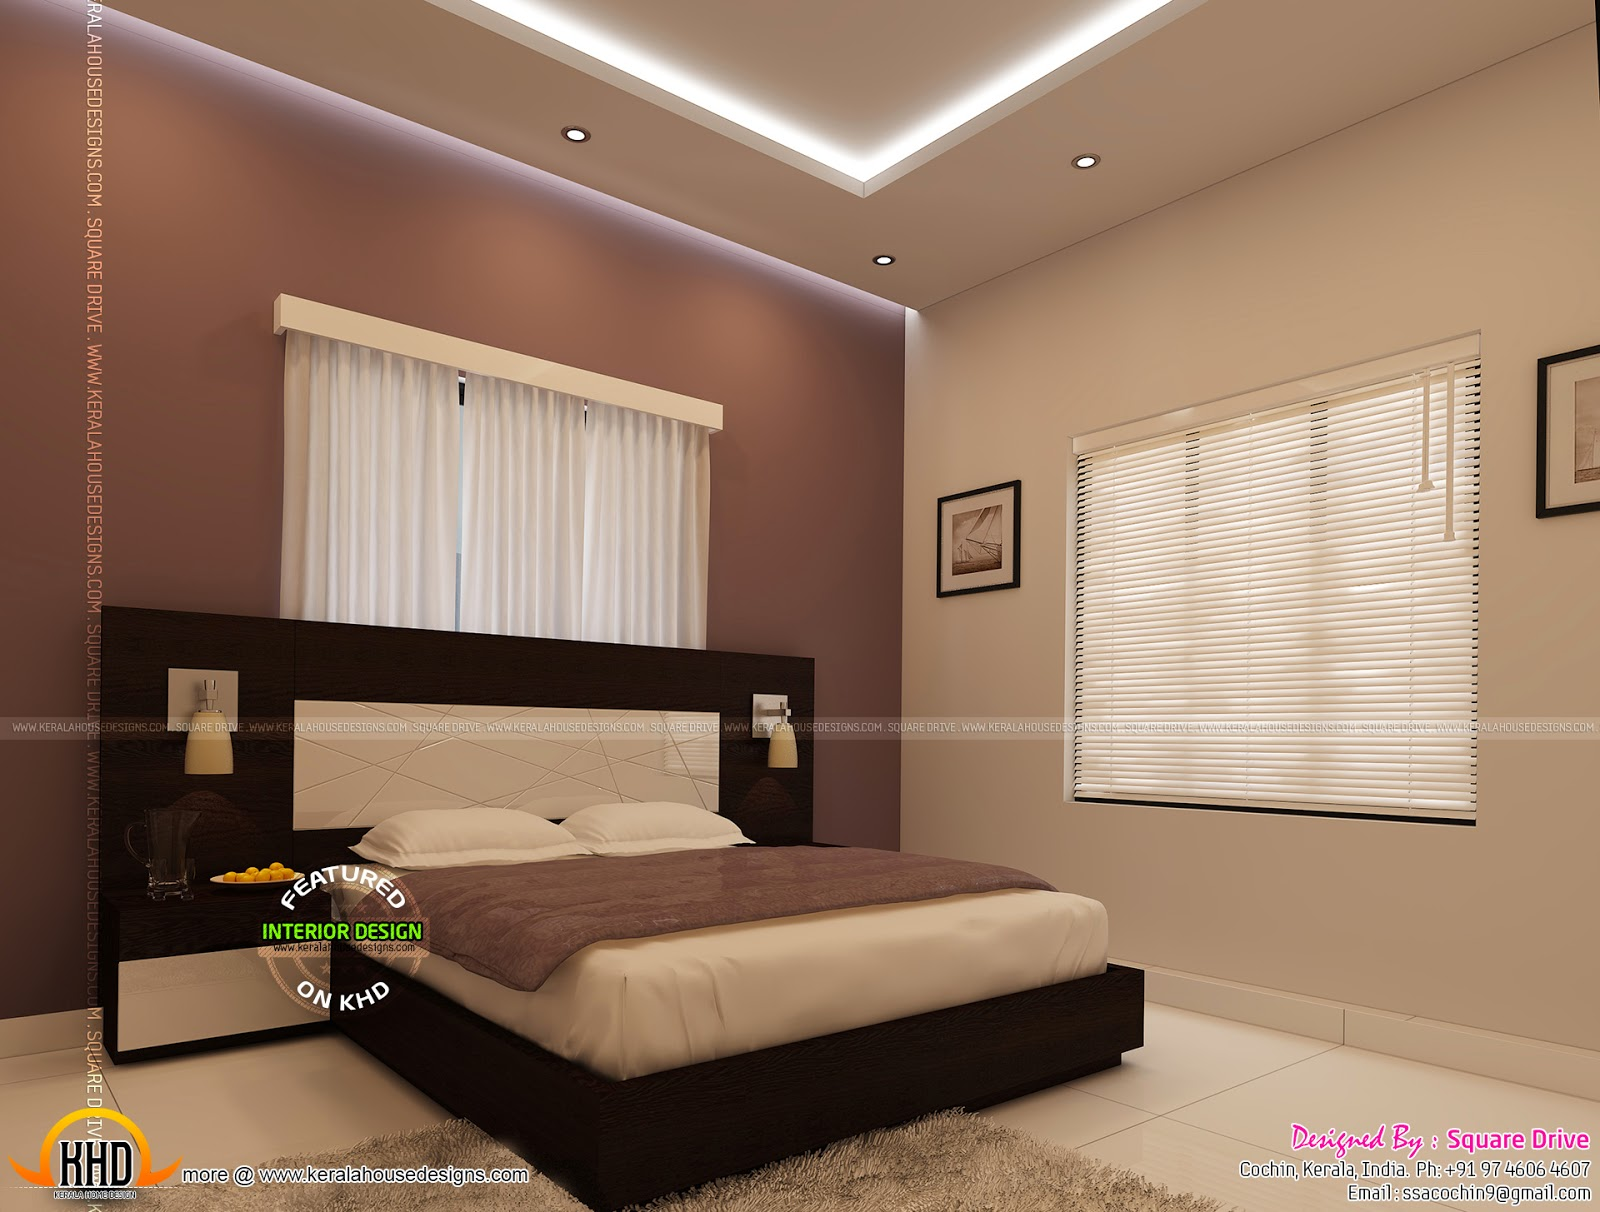 Home Interior Designing Cochin Kerala